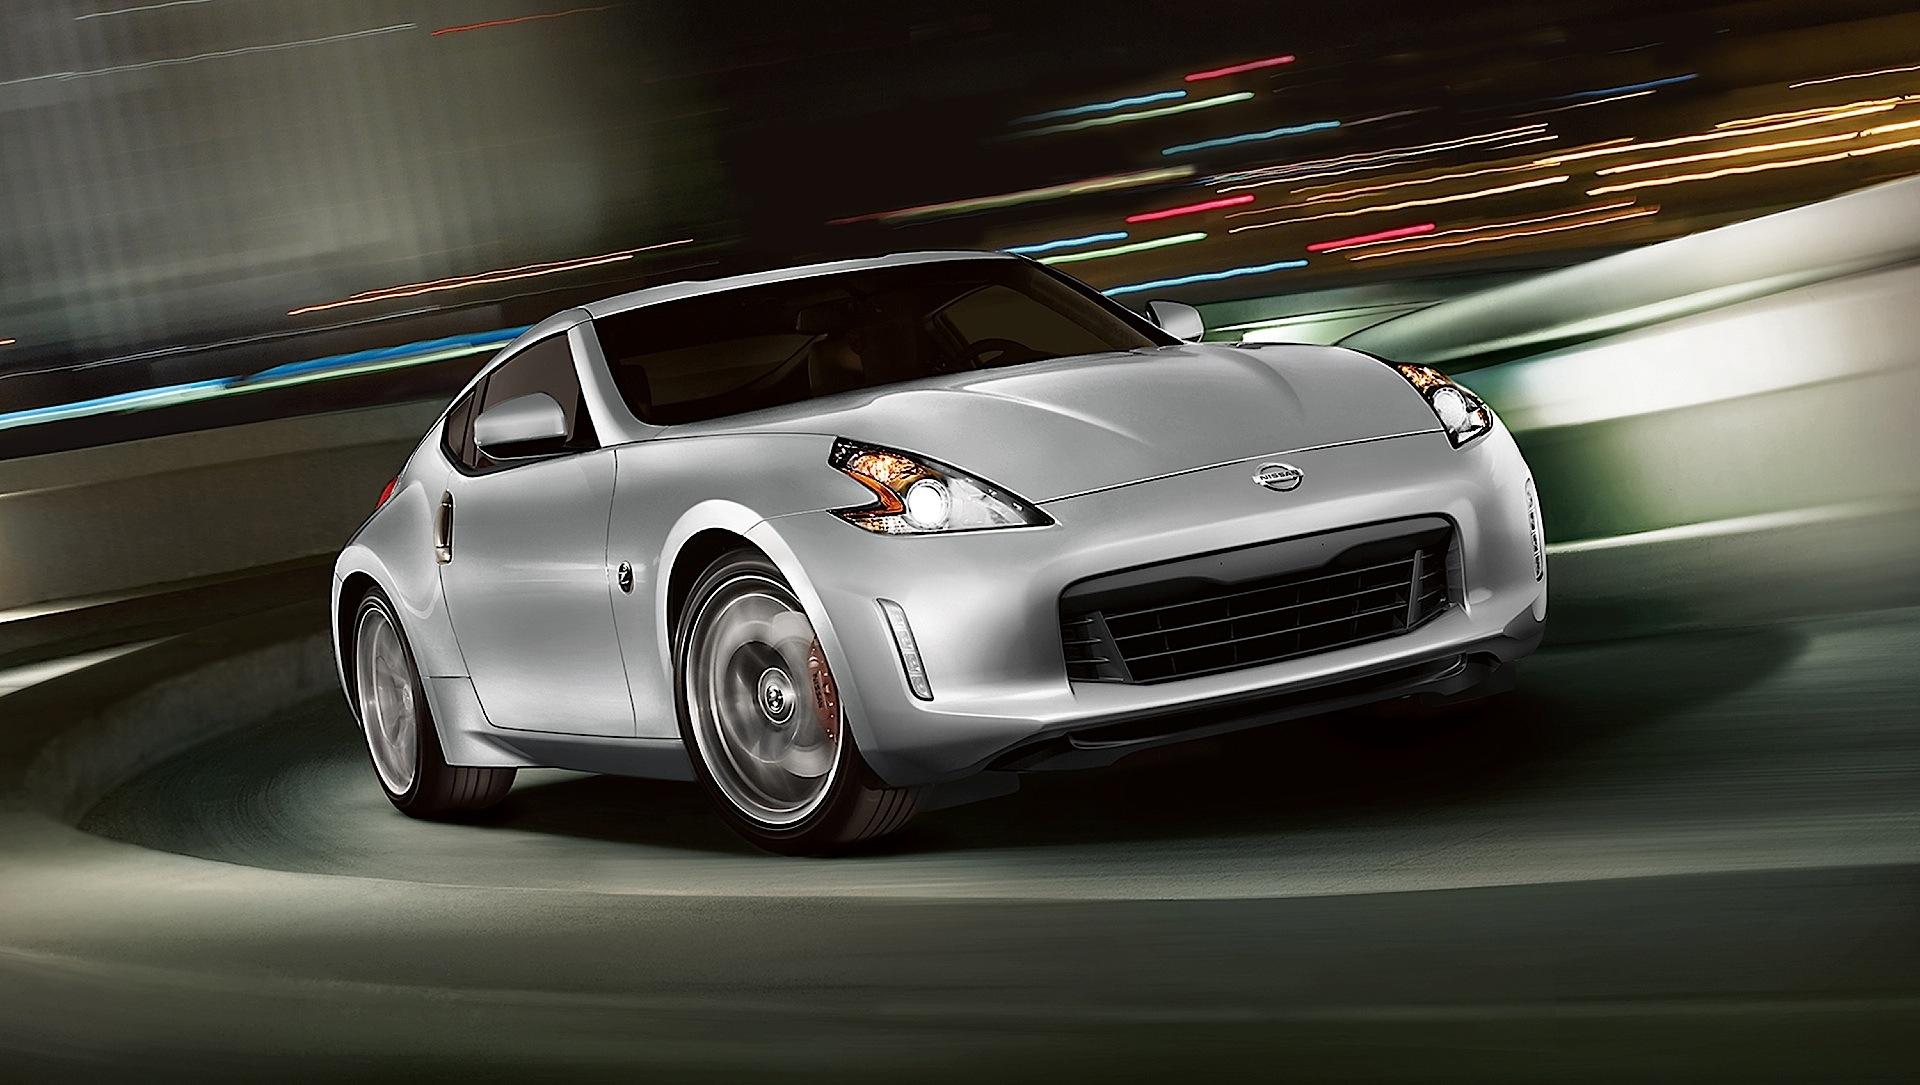 Nissan 370z coupe 2012 cars nissan pinterest nissan 370z nissan 370z coupe 2012 vanachro Image collections